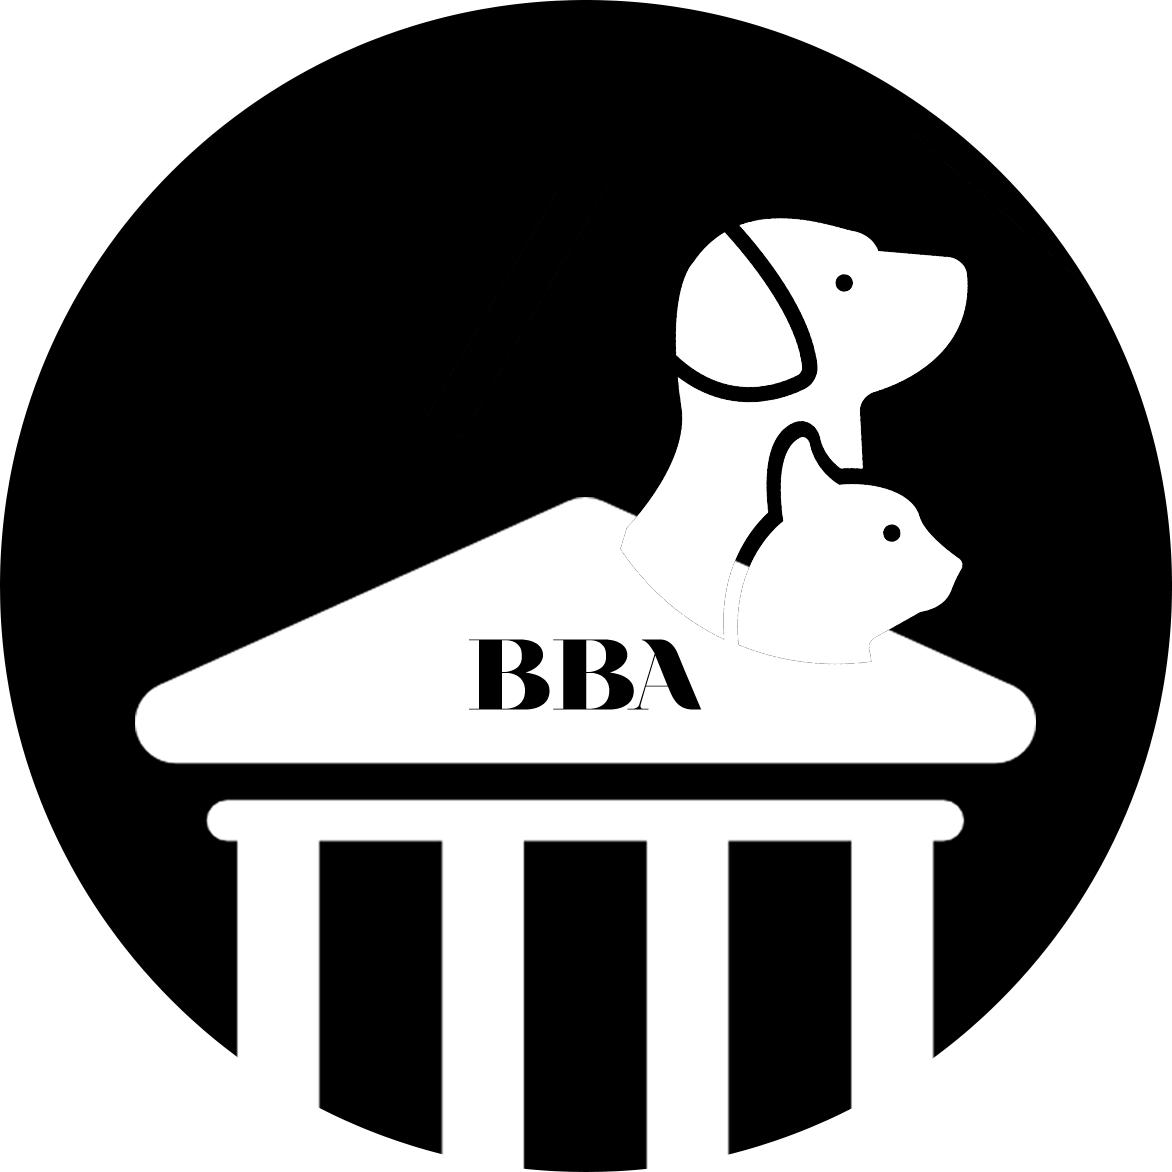 Breeding Business Academy